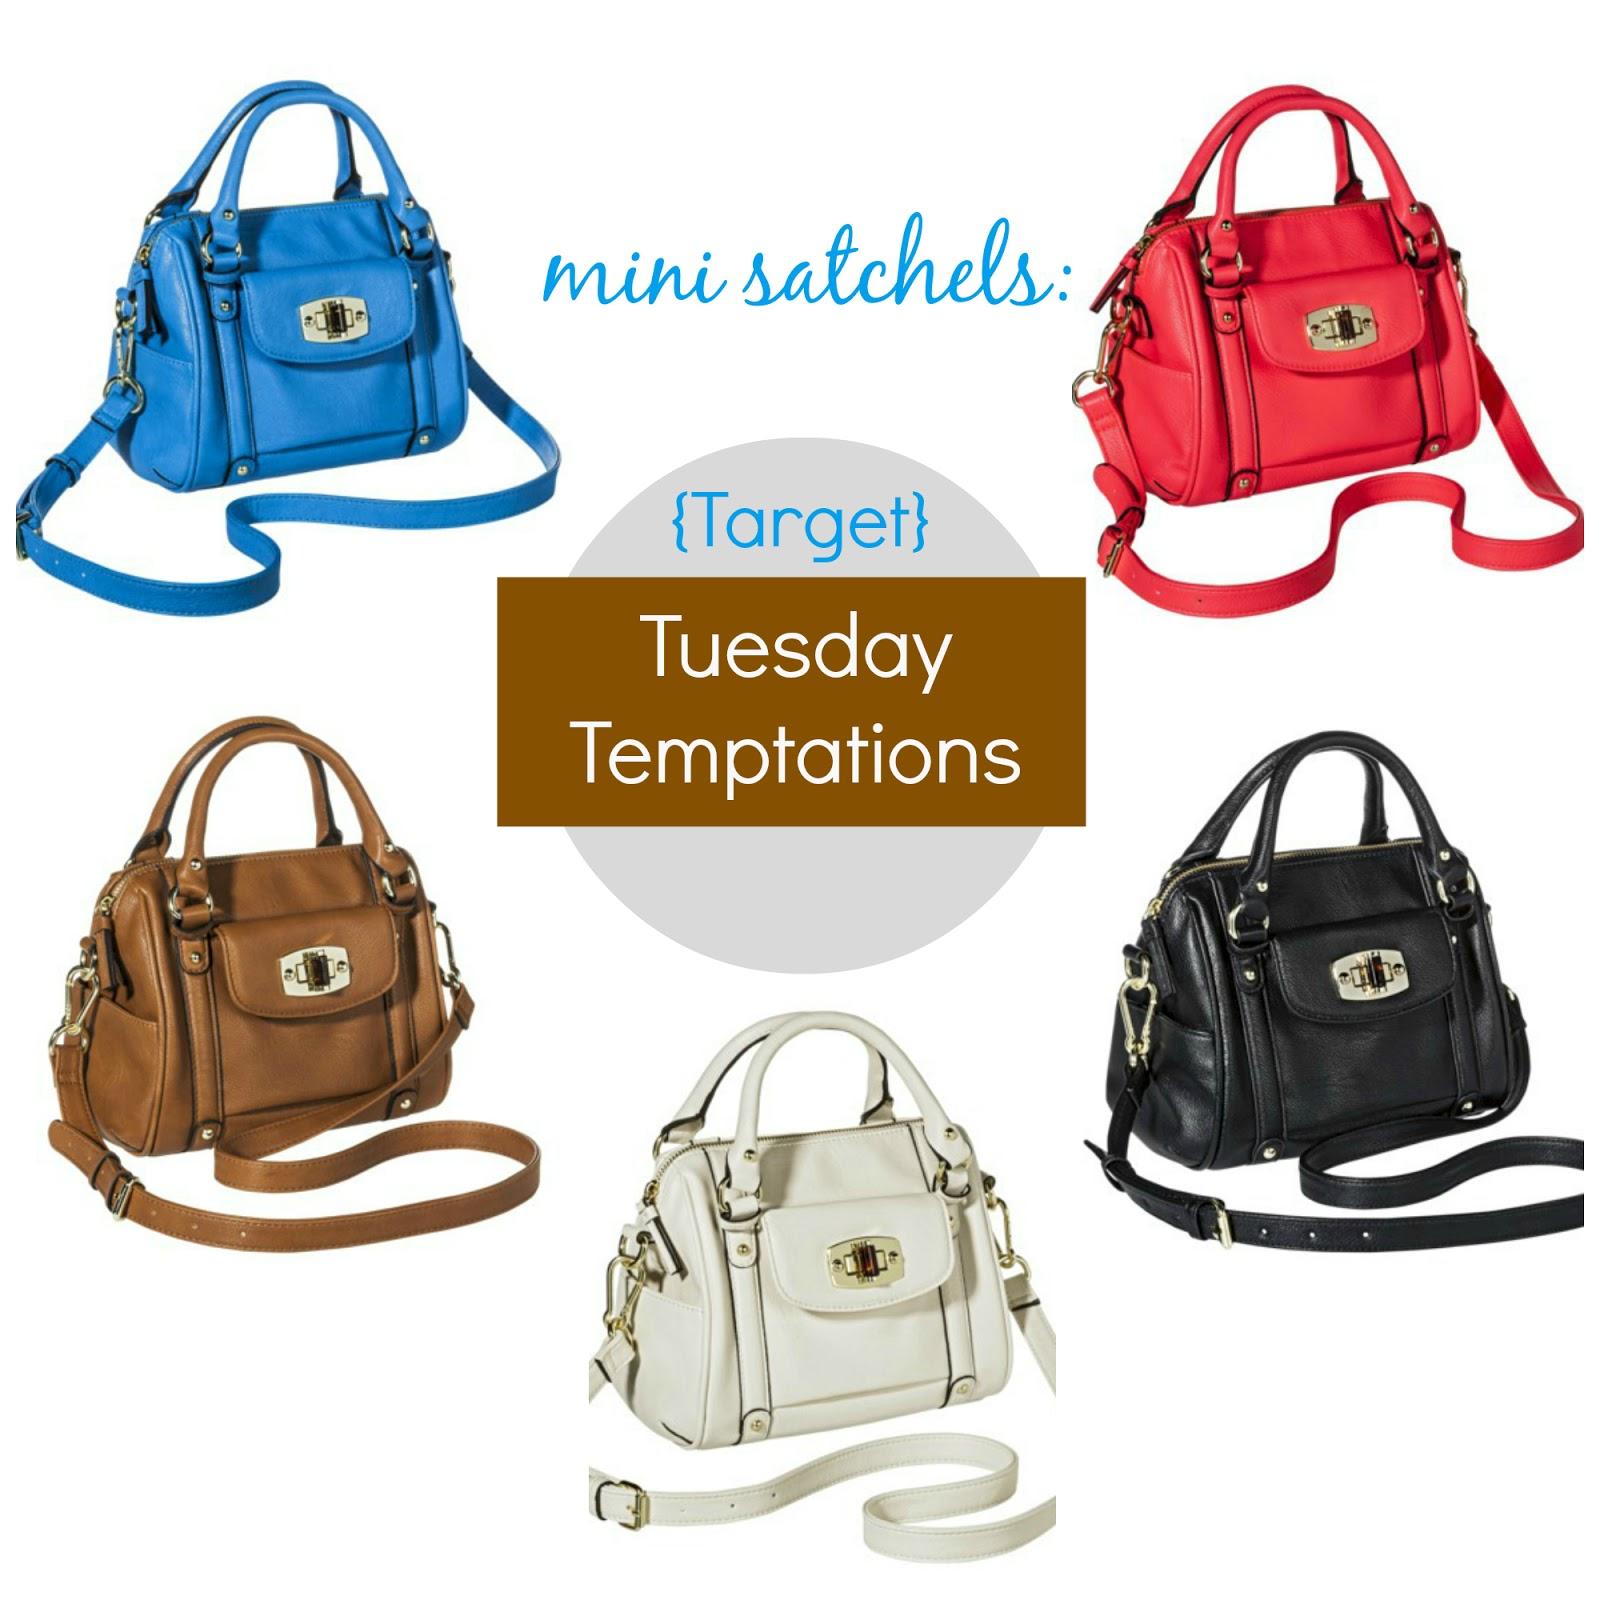 Target Tuesday Temptations Mini Satchel Handbags